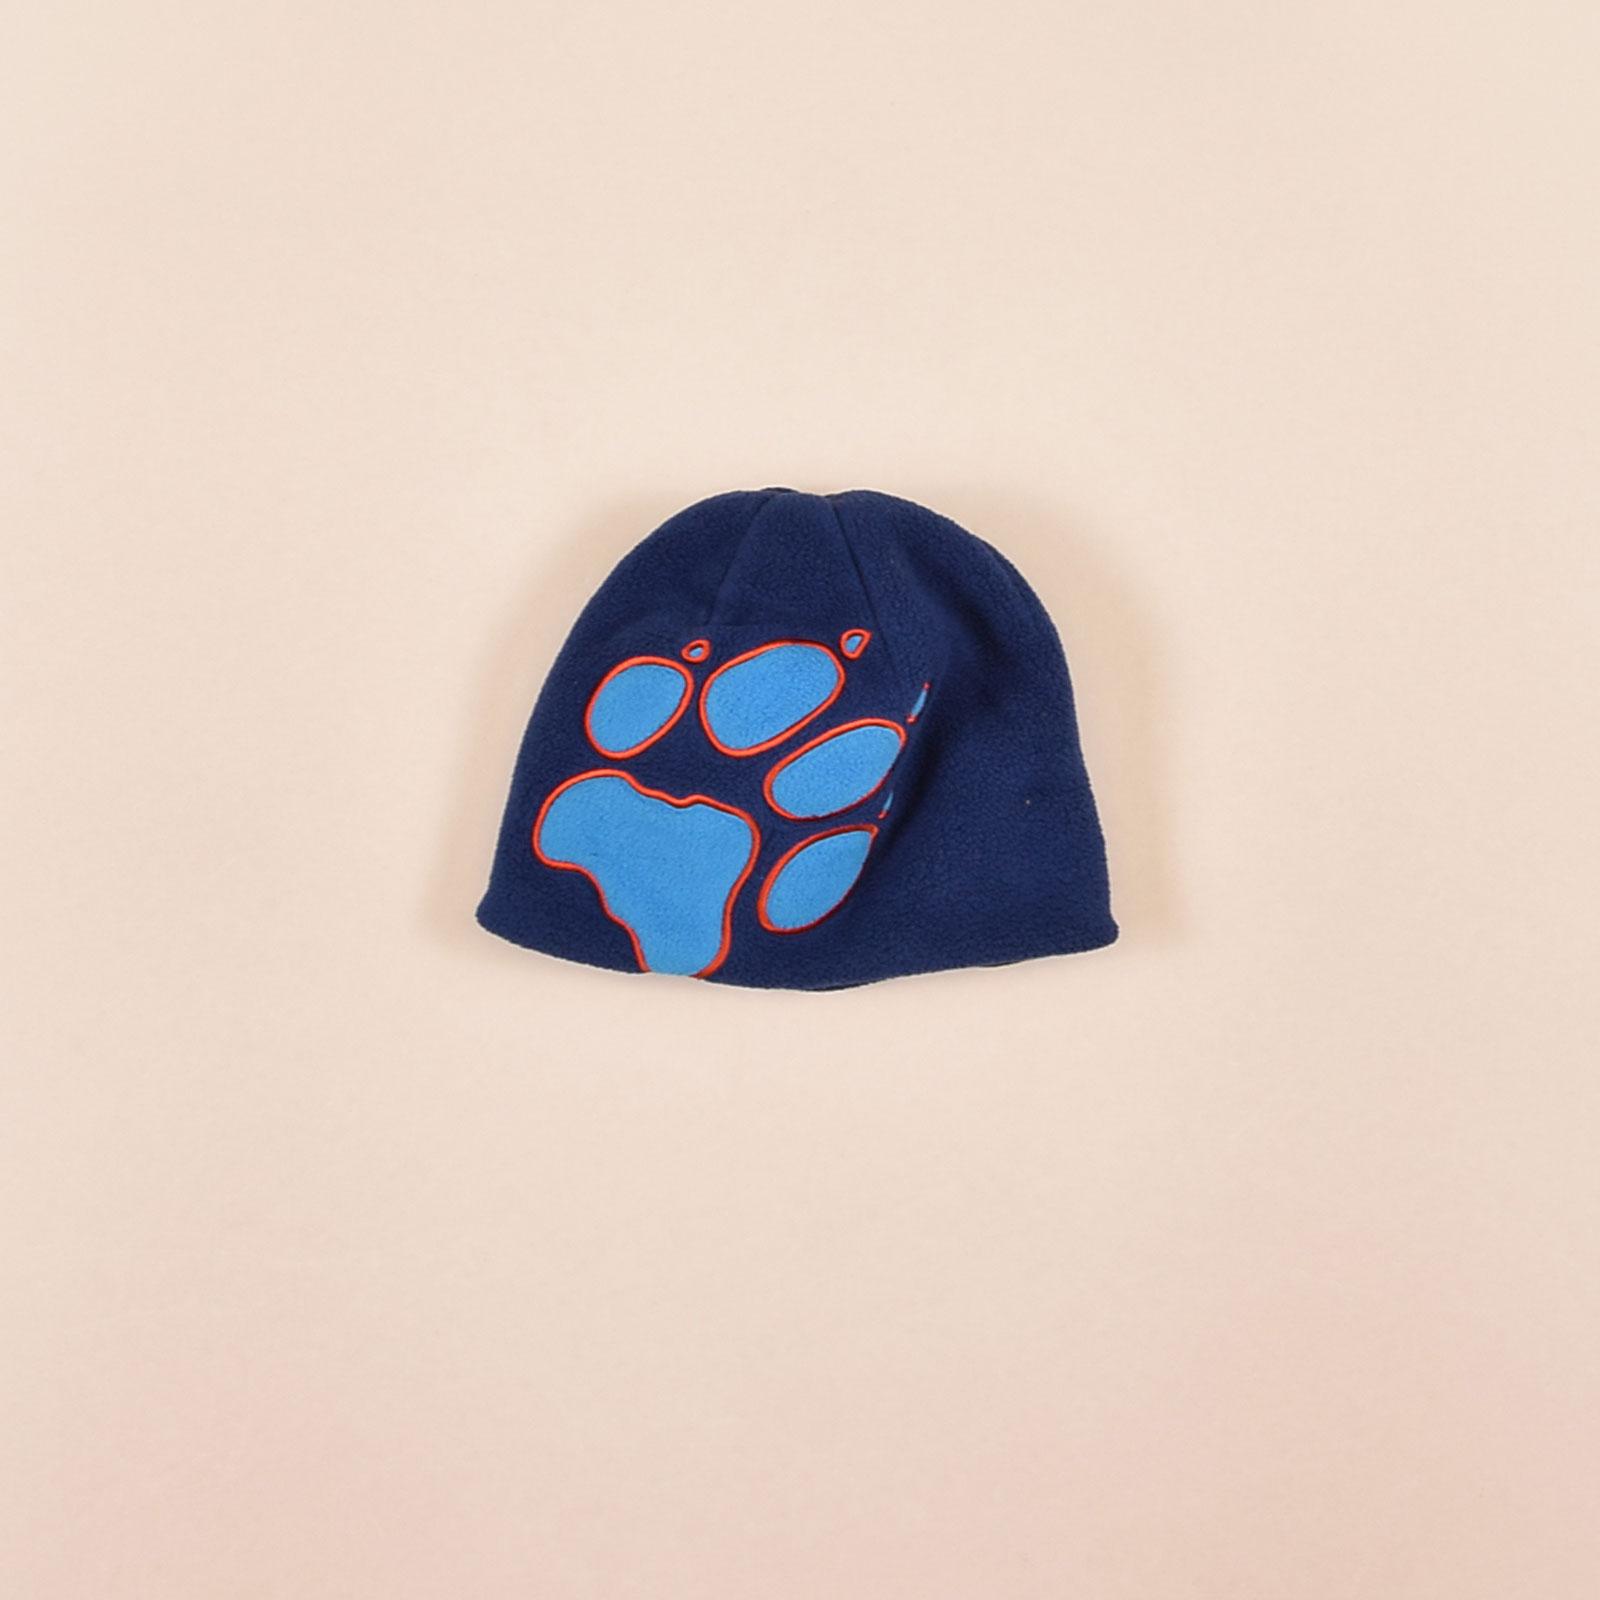 Details zu Jack Wolfskin Junge Kinder Mütze Kappe Gr.One Size Fleece Blau, 72359